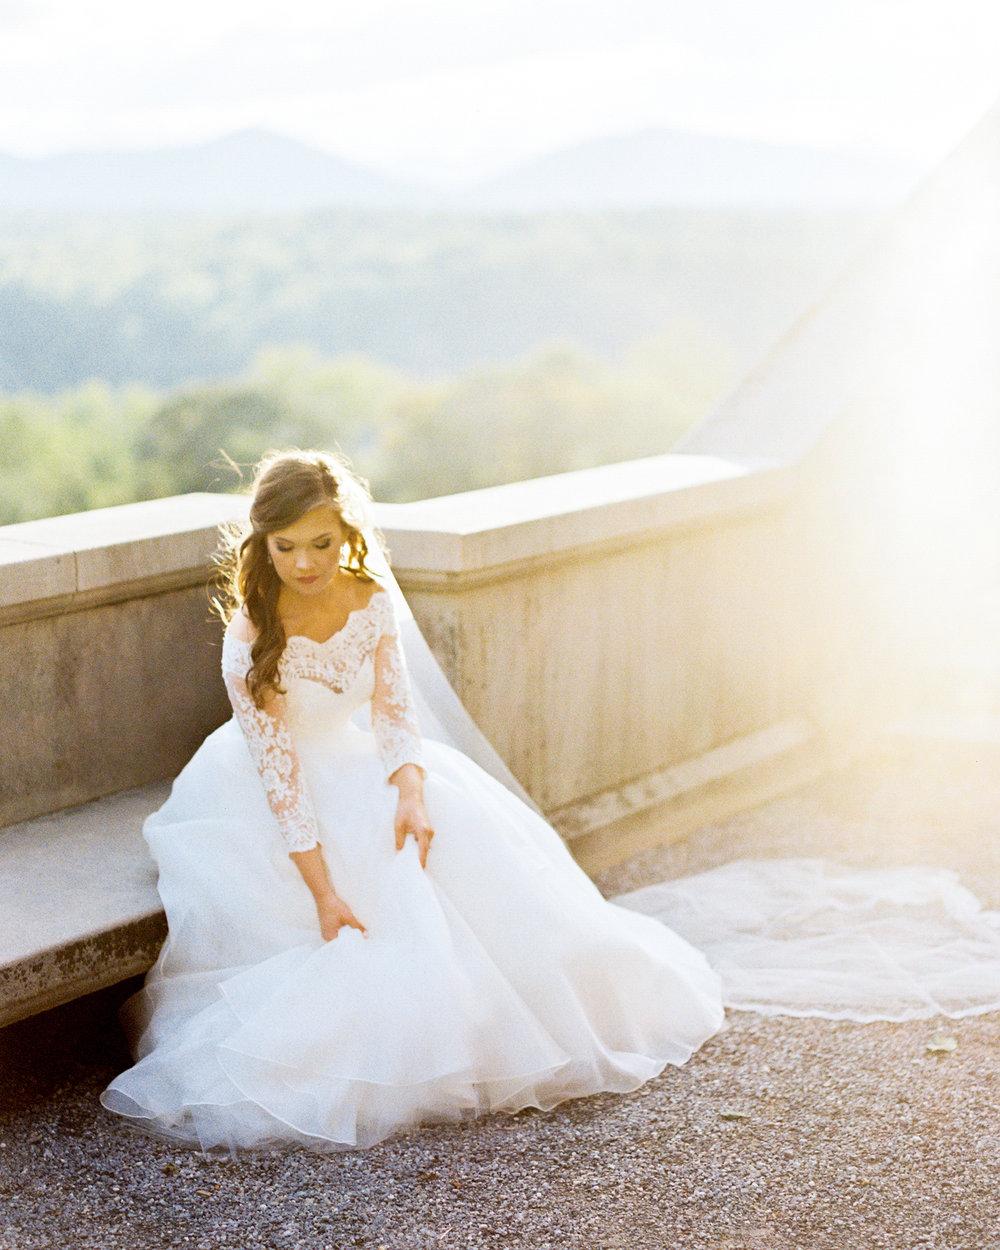 timeless-classy-cathedral-veil-bridal-session-biltmore-north-carolina-wedding-film-photographer-16.jpg